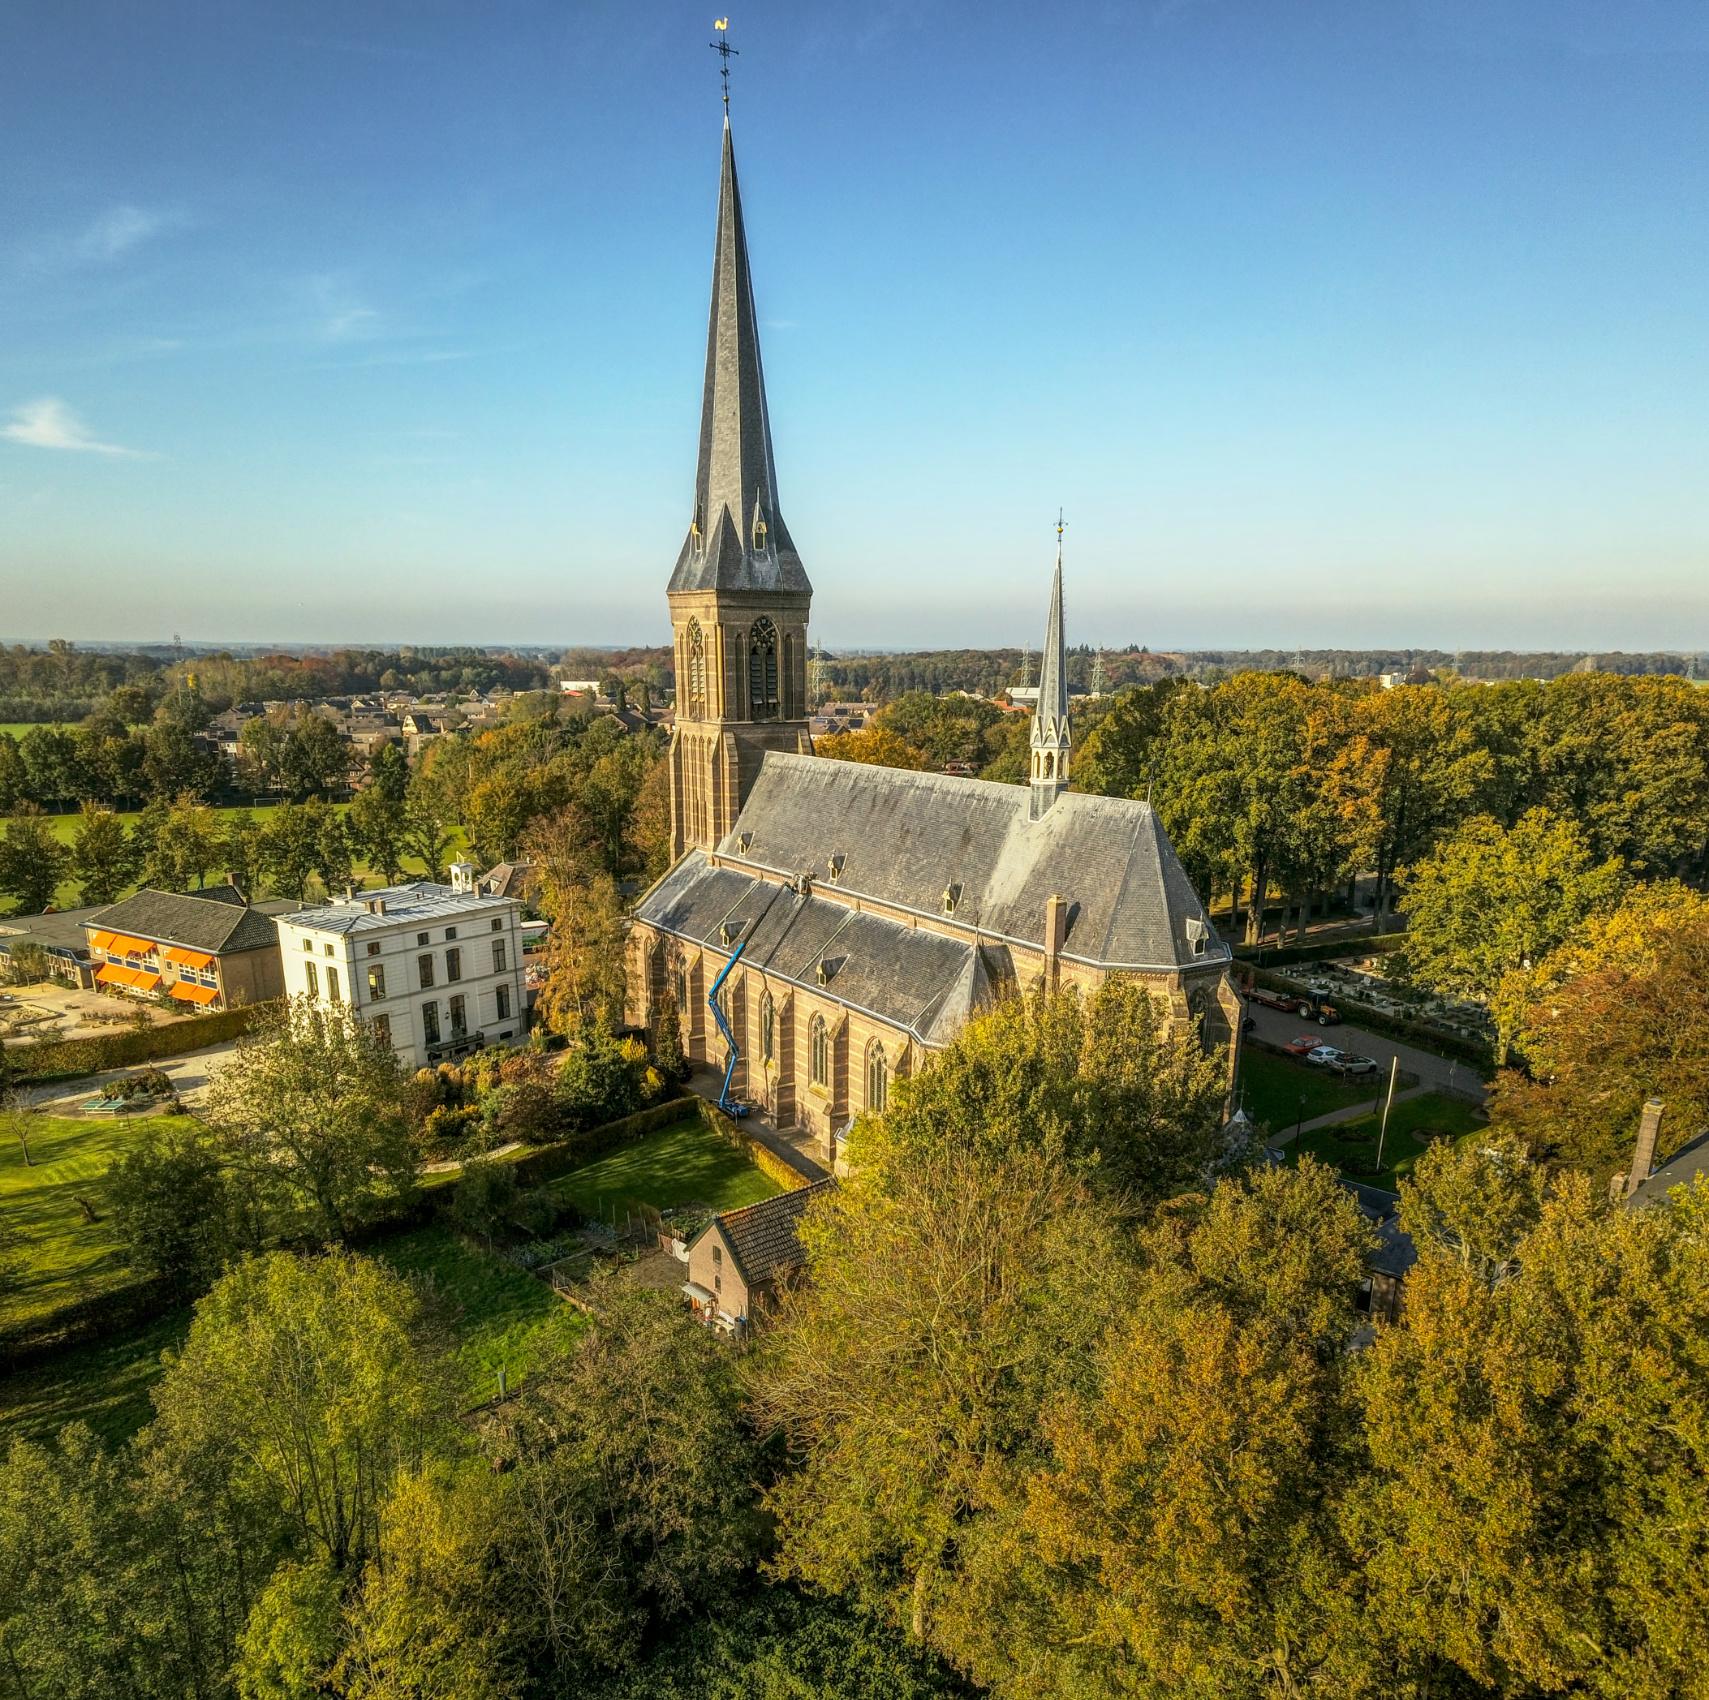 s2019-10-13_1352 Twello Kerk 01.jpg